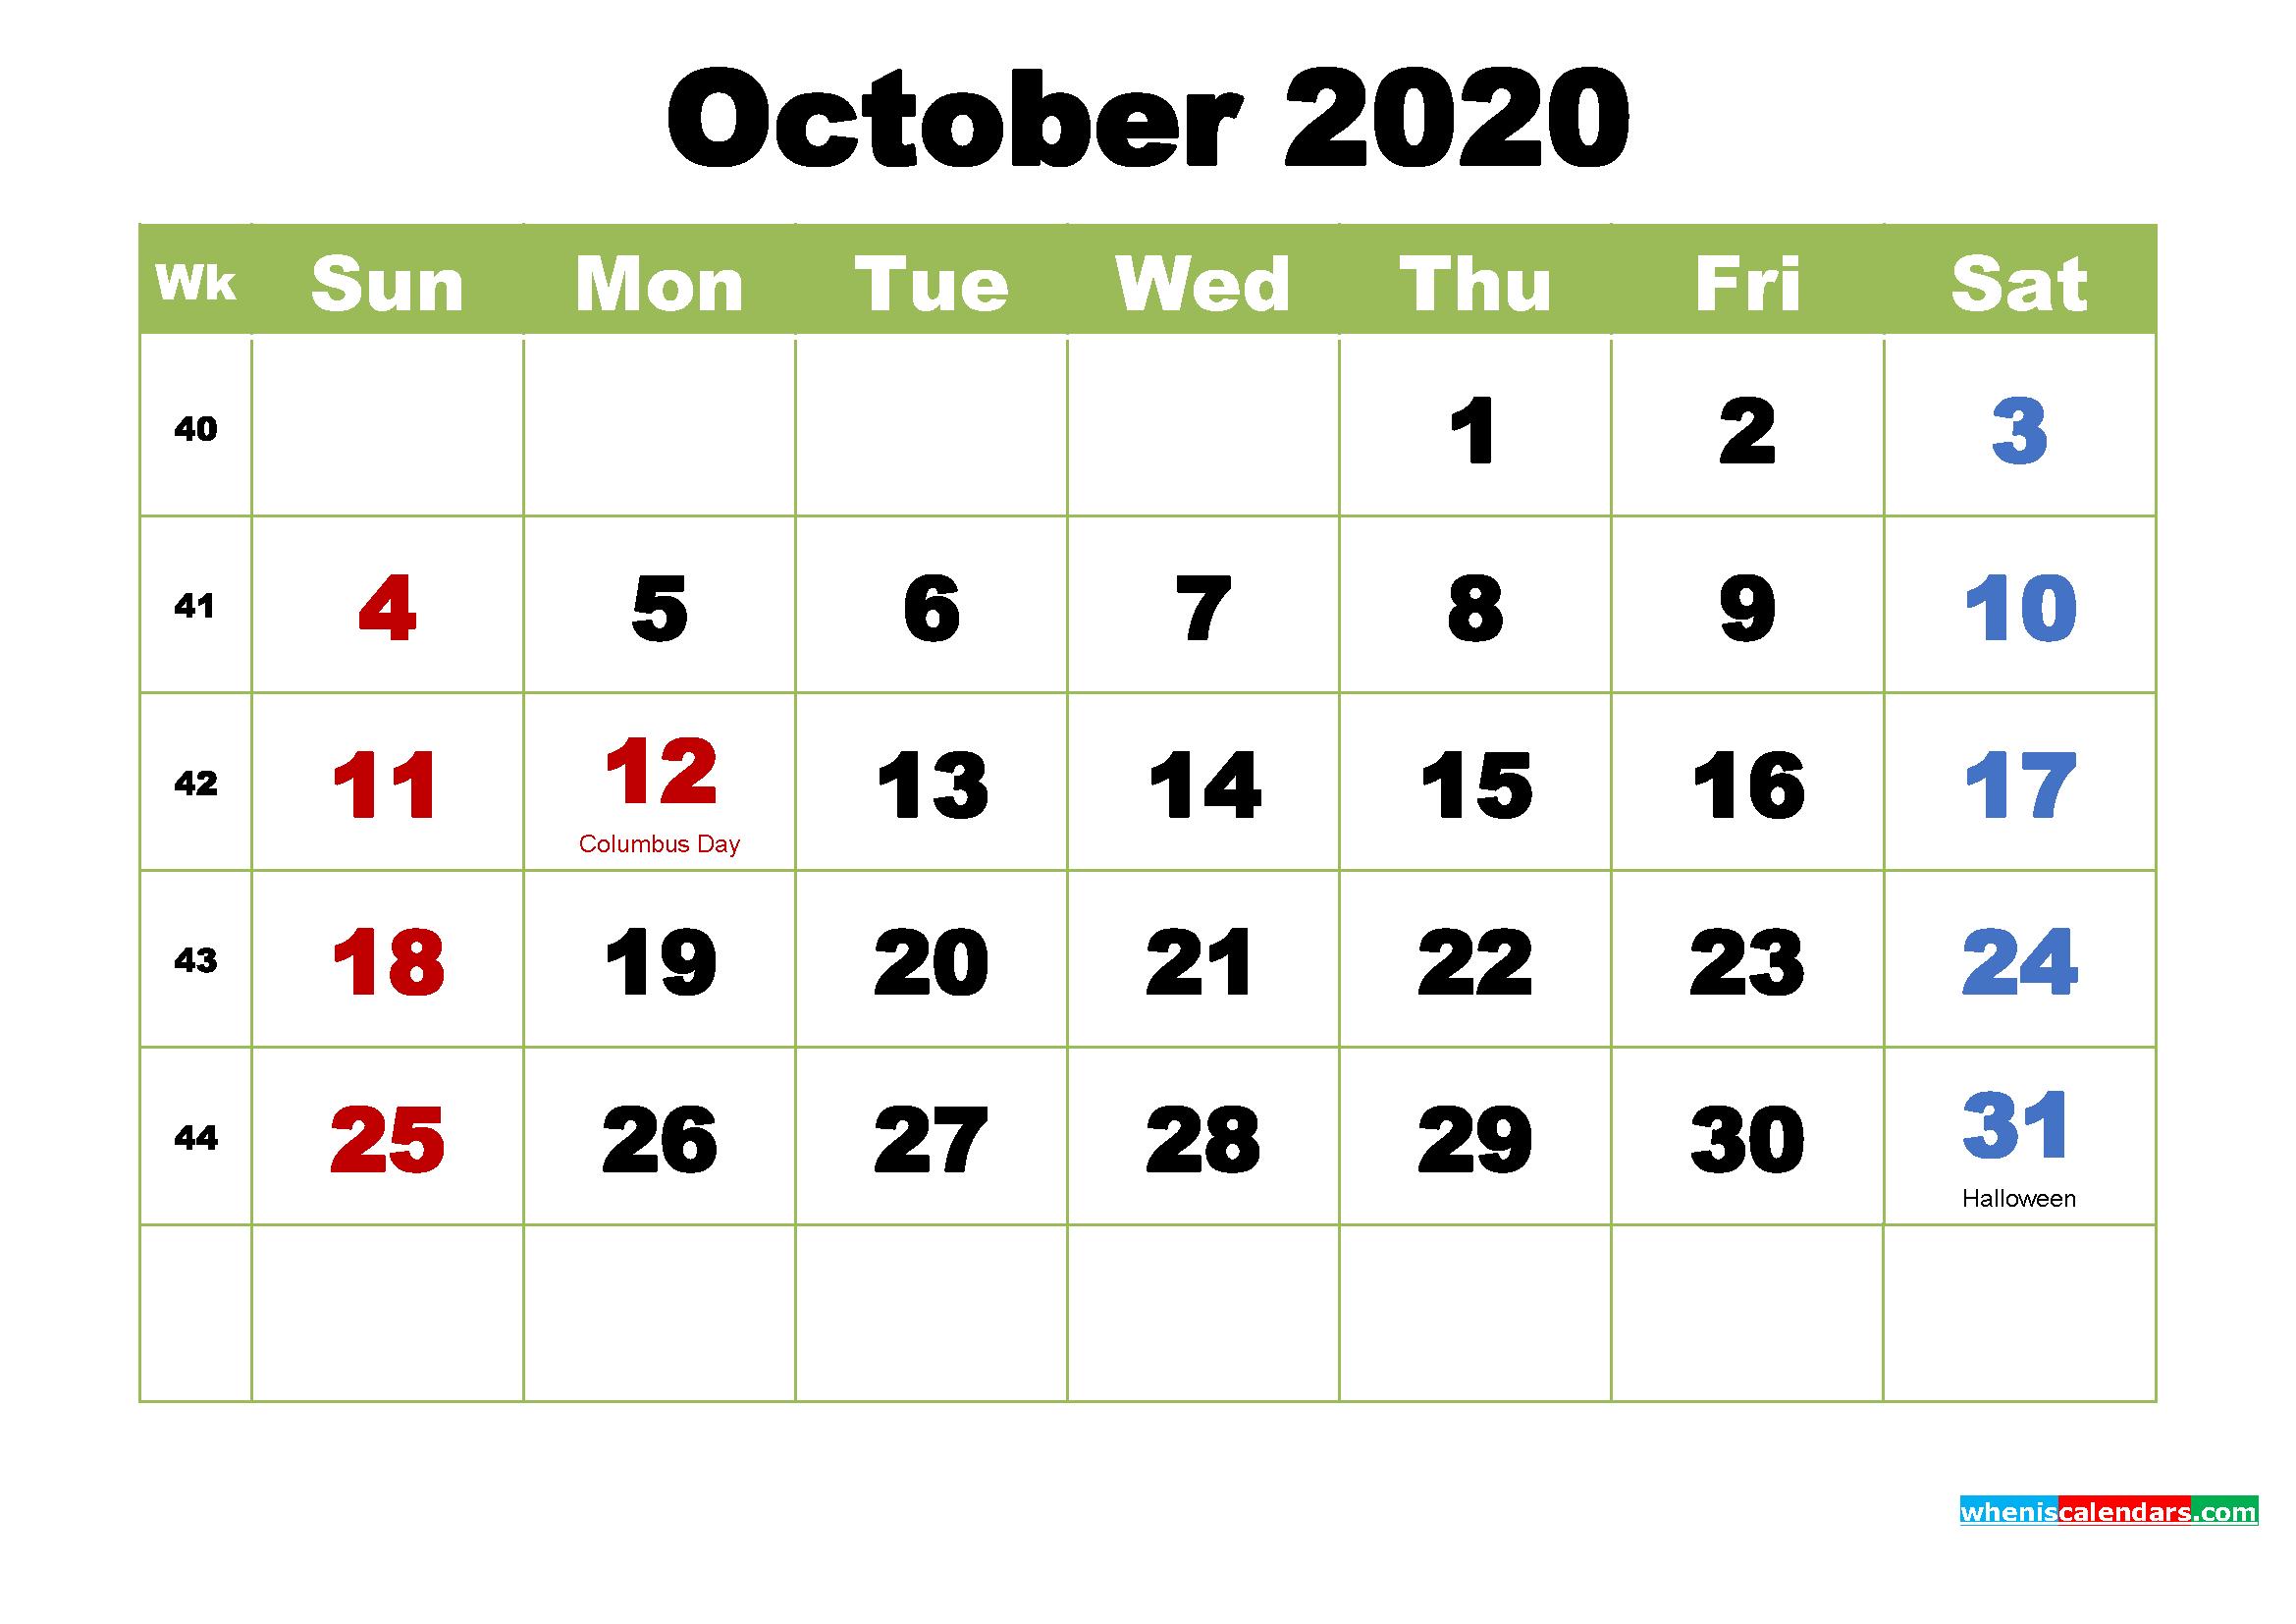 October 2020 Desktop Calendar with Holidays